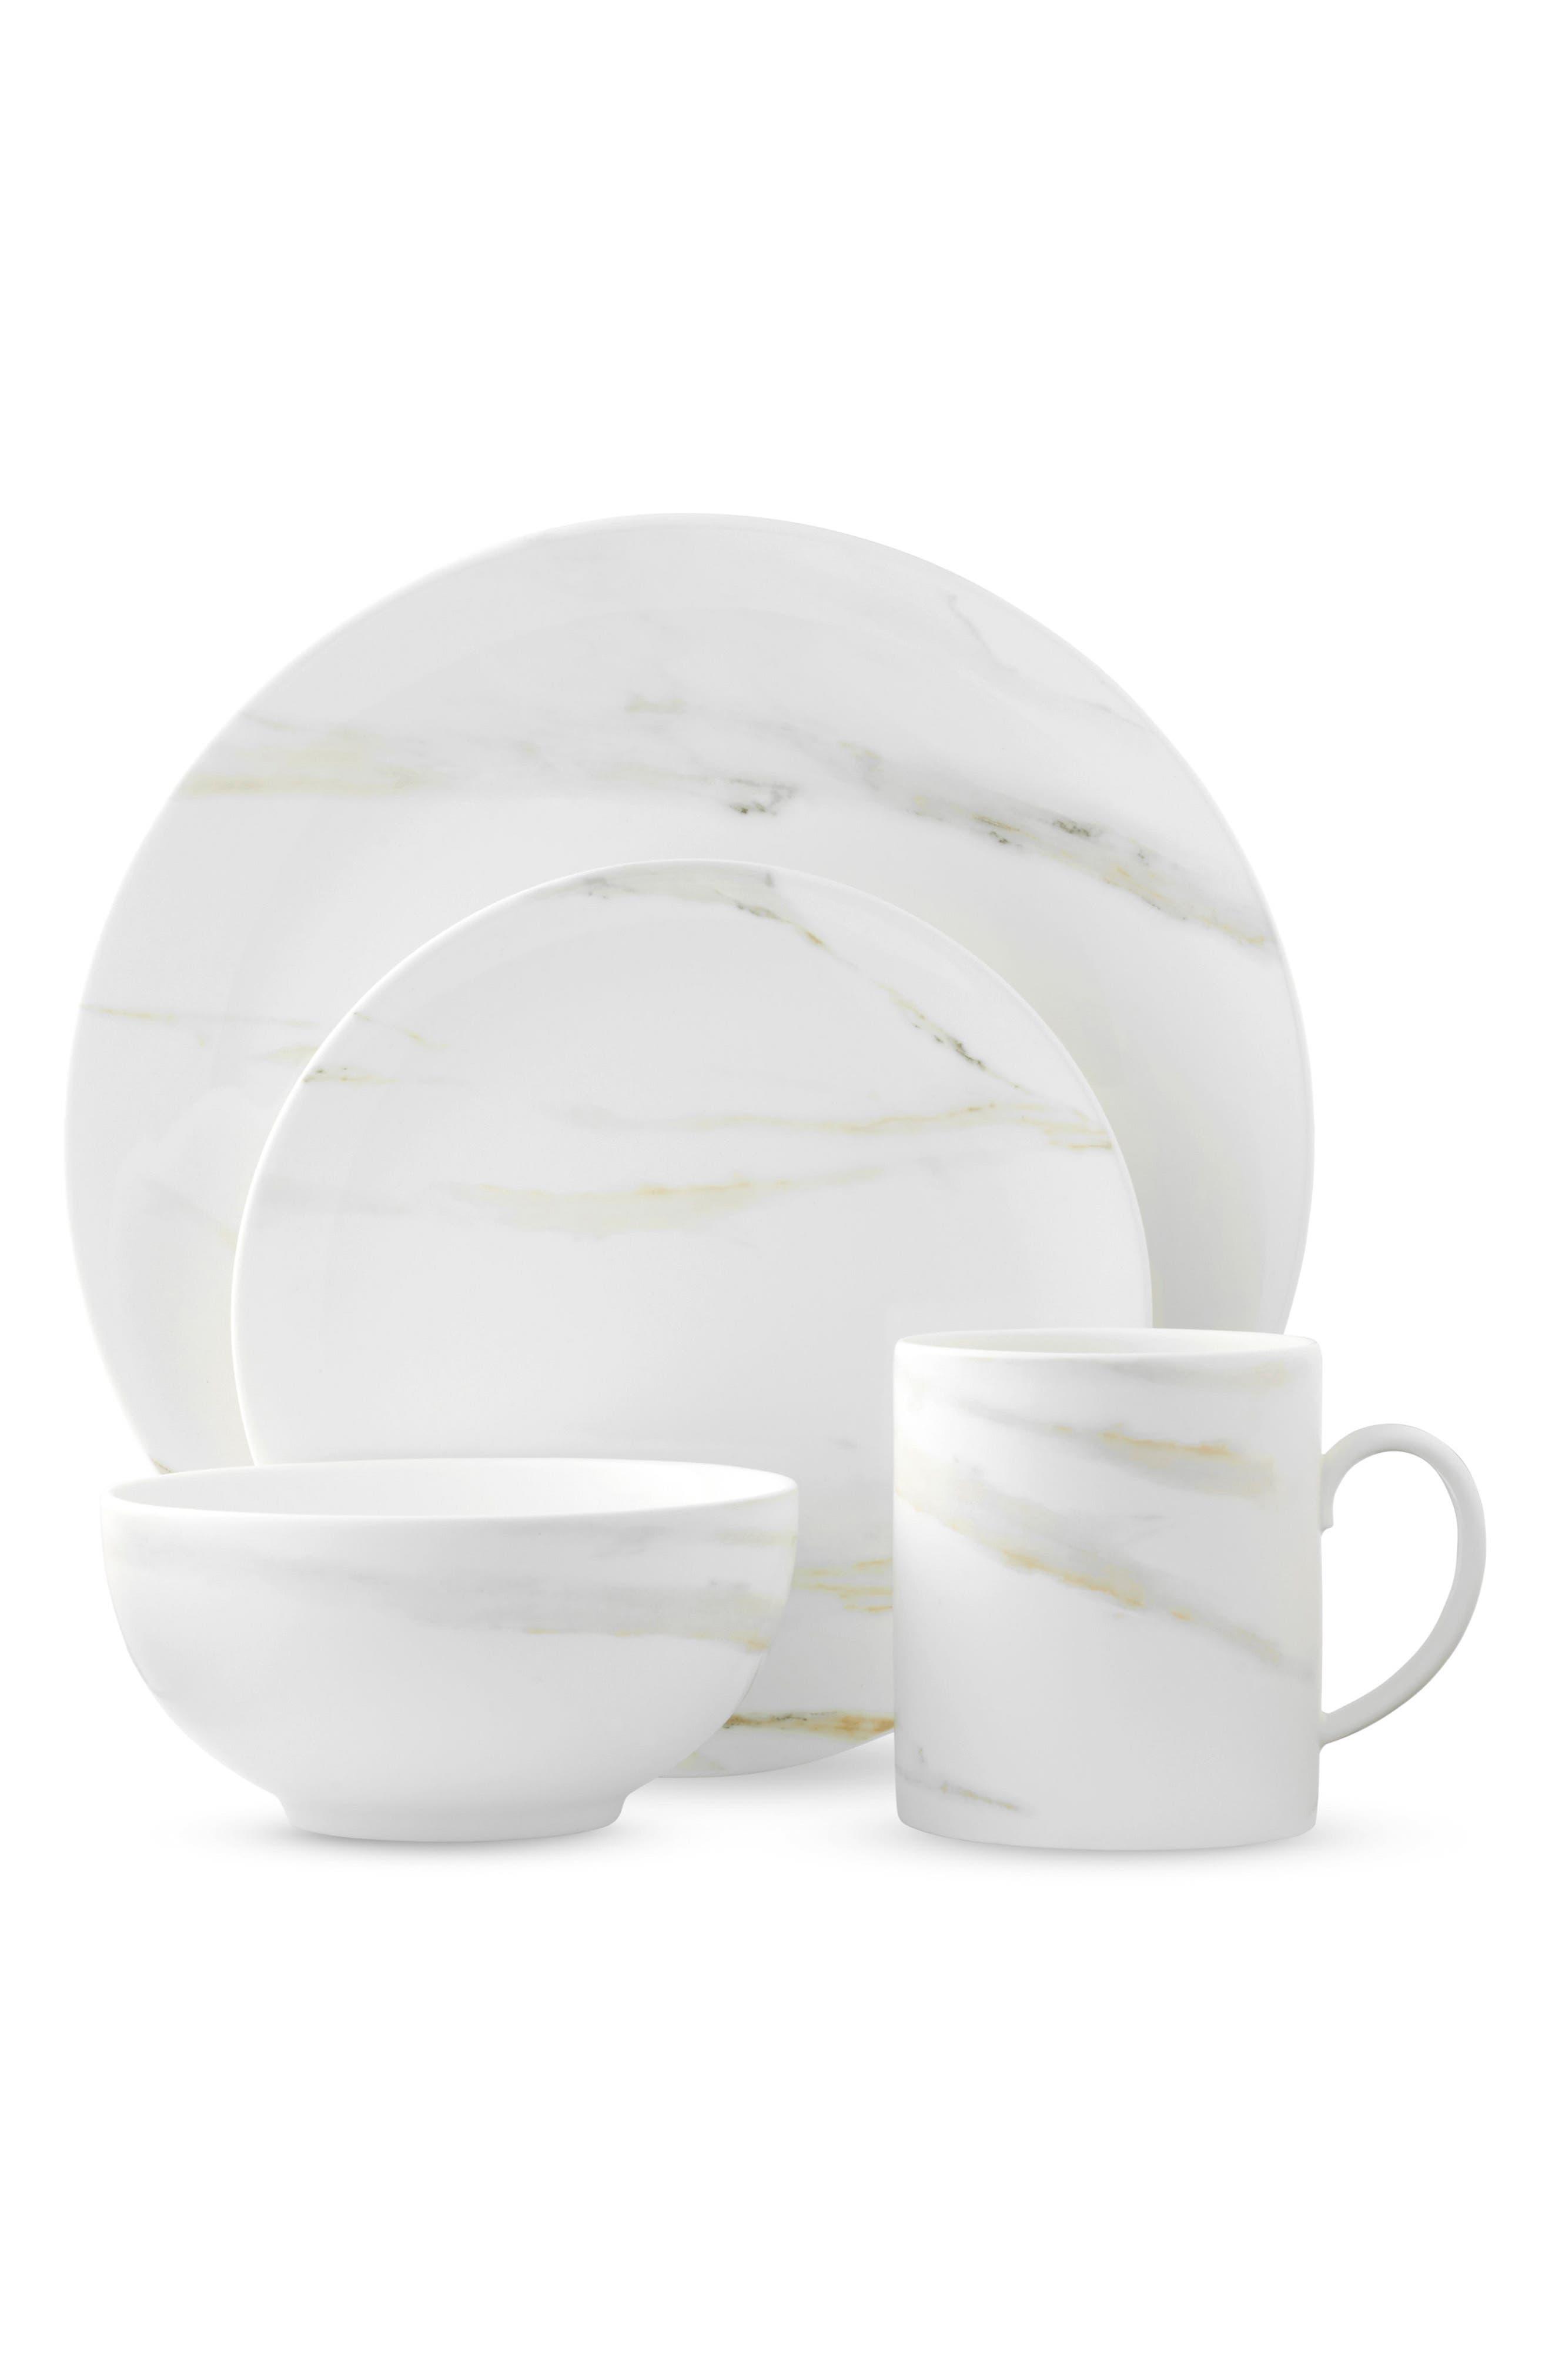 Vera Wang x Wedgwood Venato Imperial 4-Piece Bone China Dinnerware Place Setting